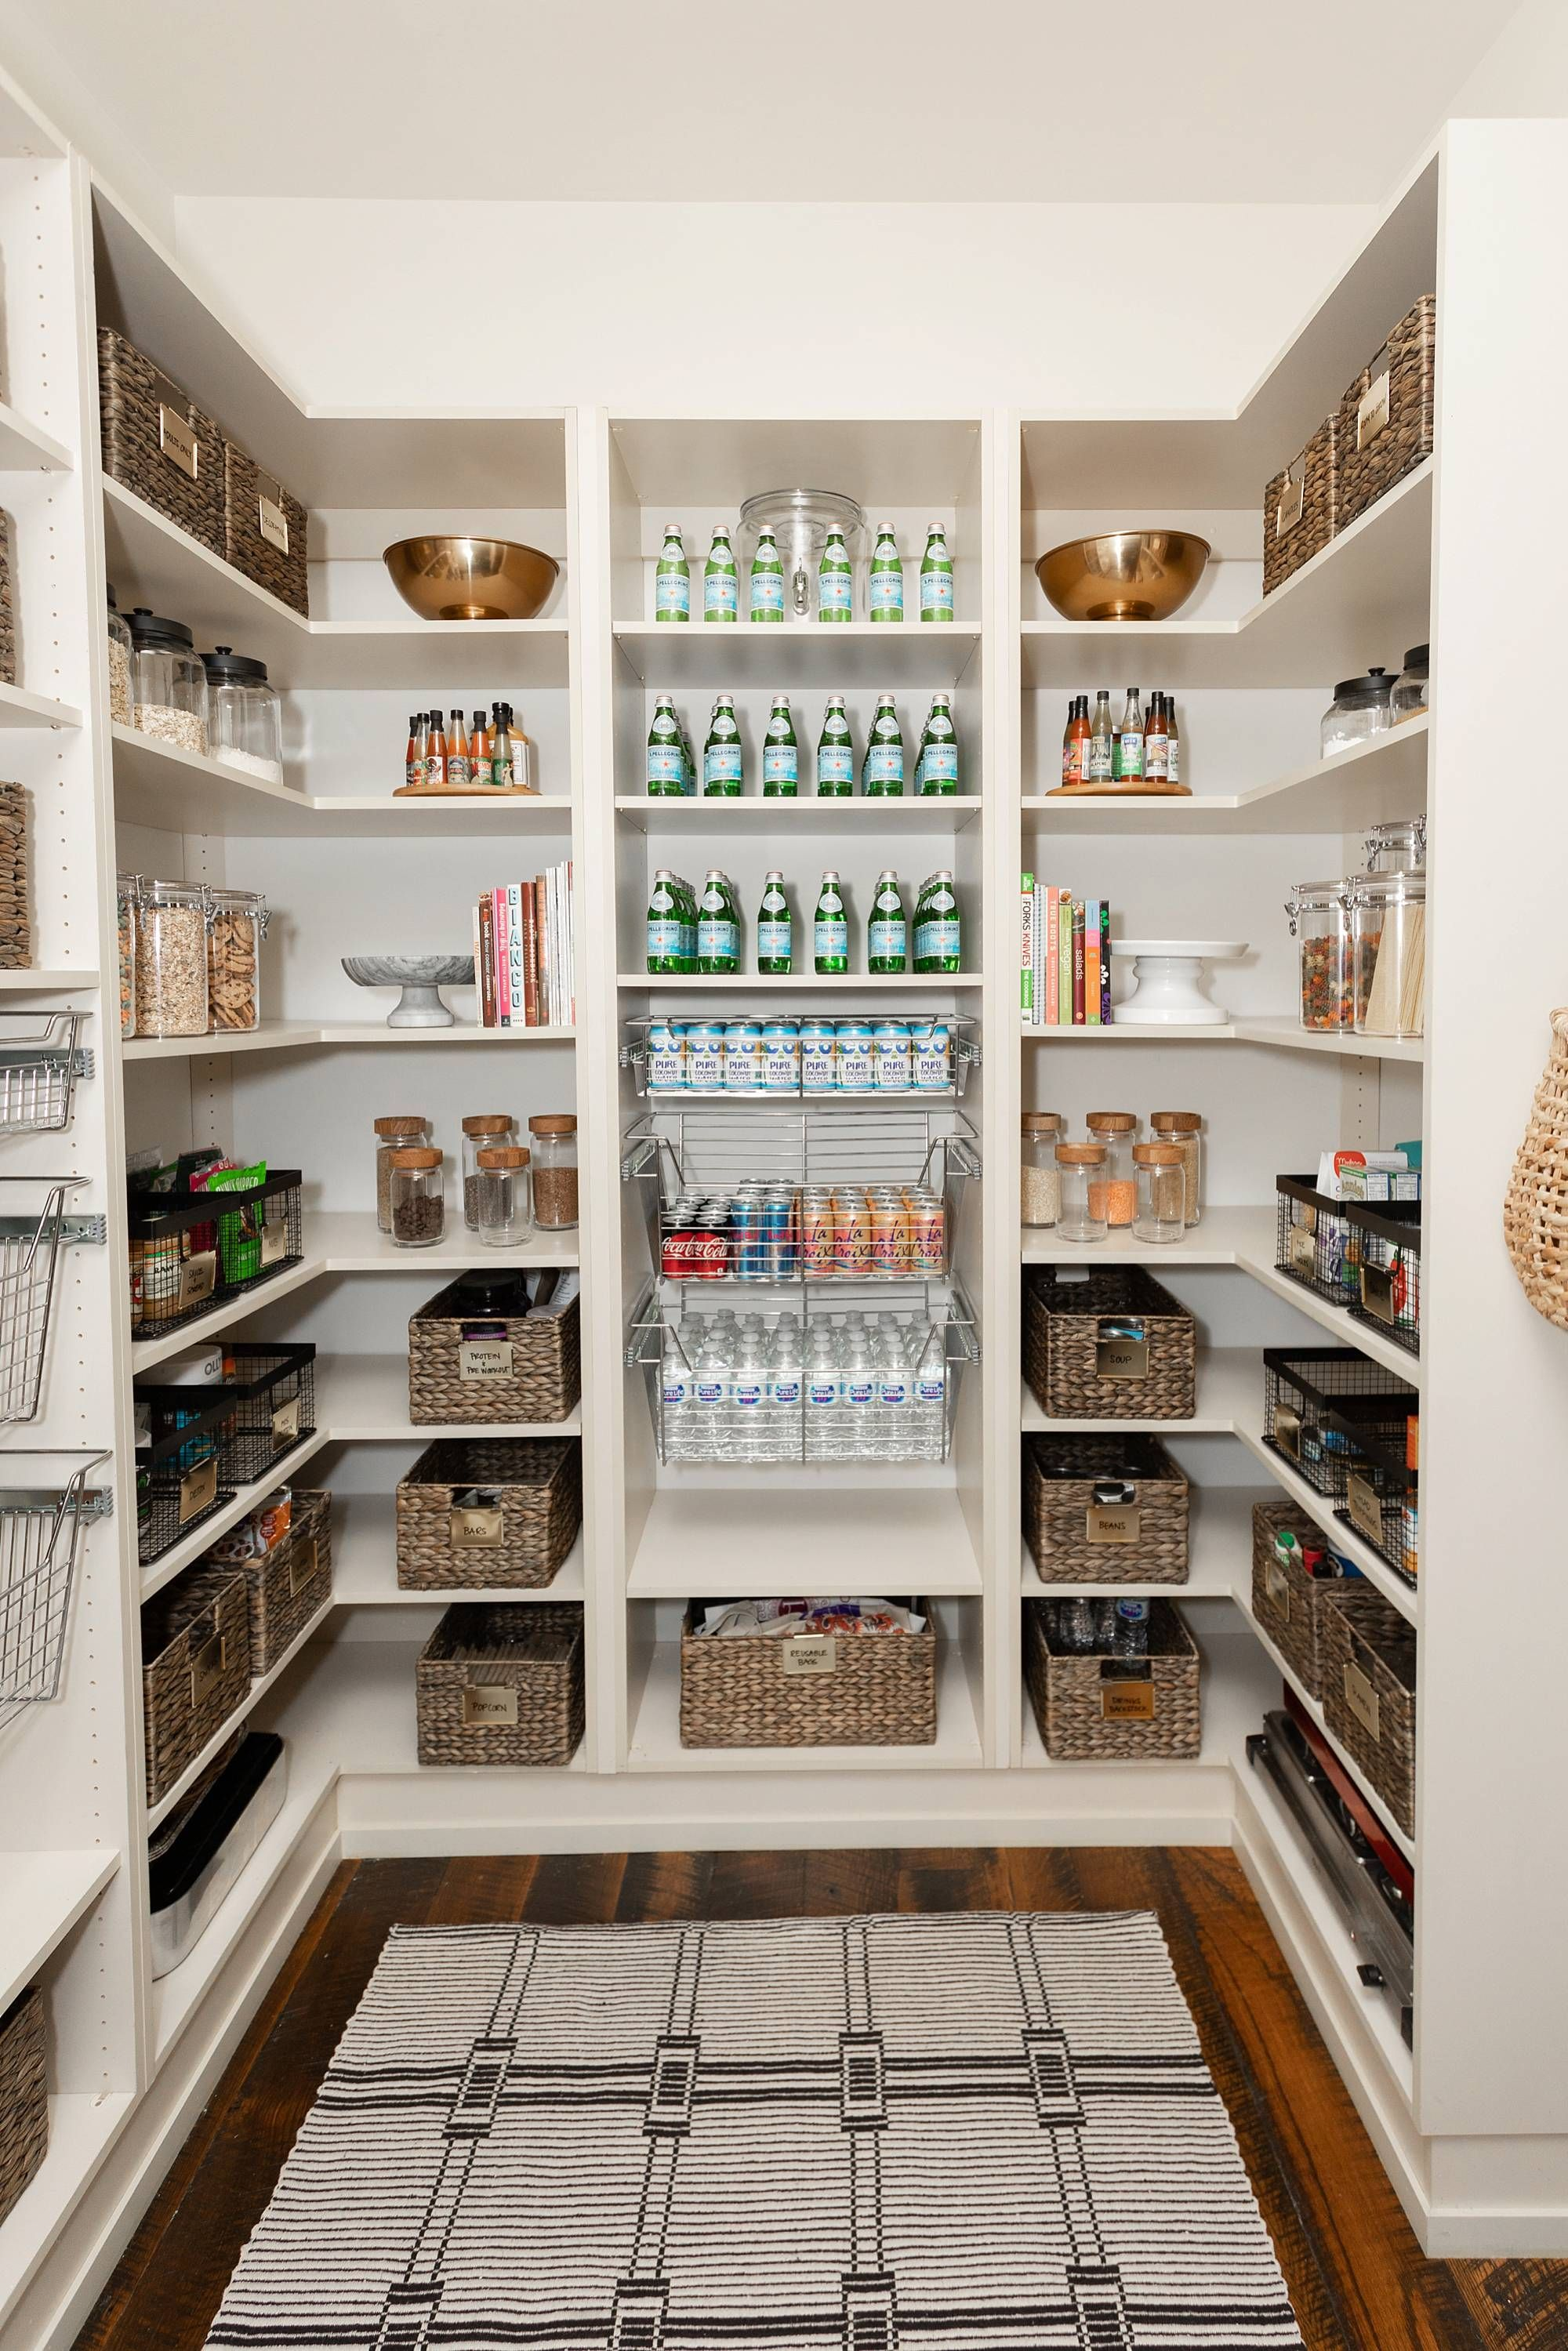 Home Organization Tips from a Professional Organizer | Diana Elizabeth